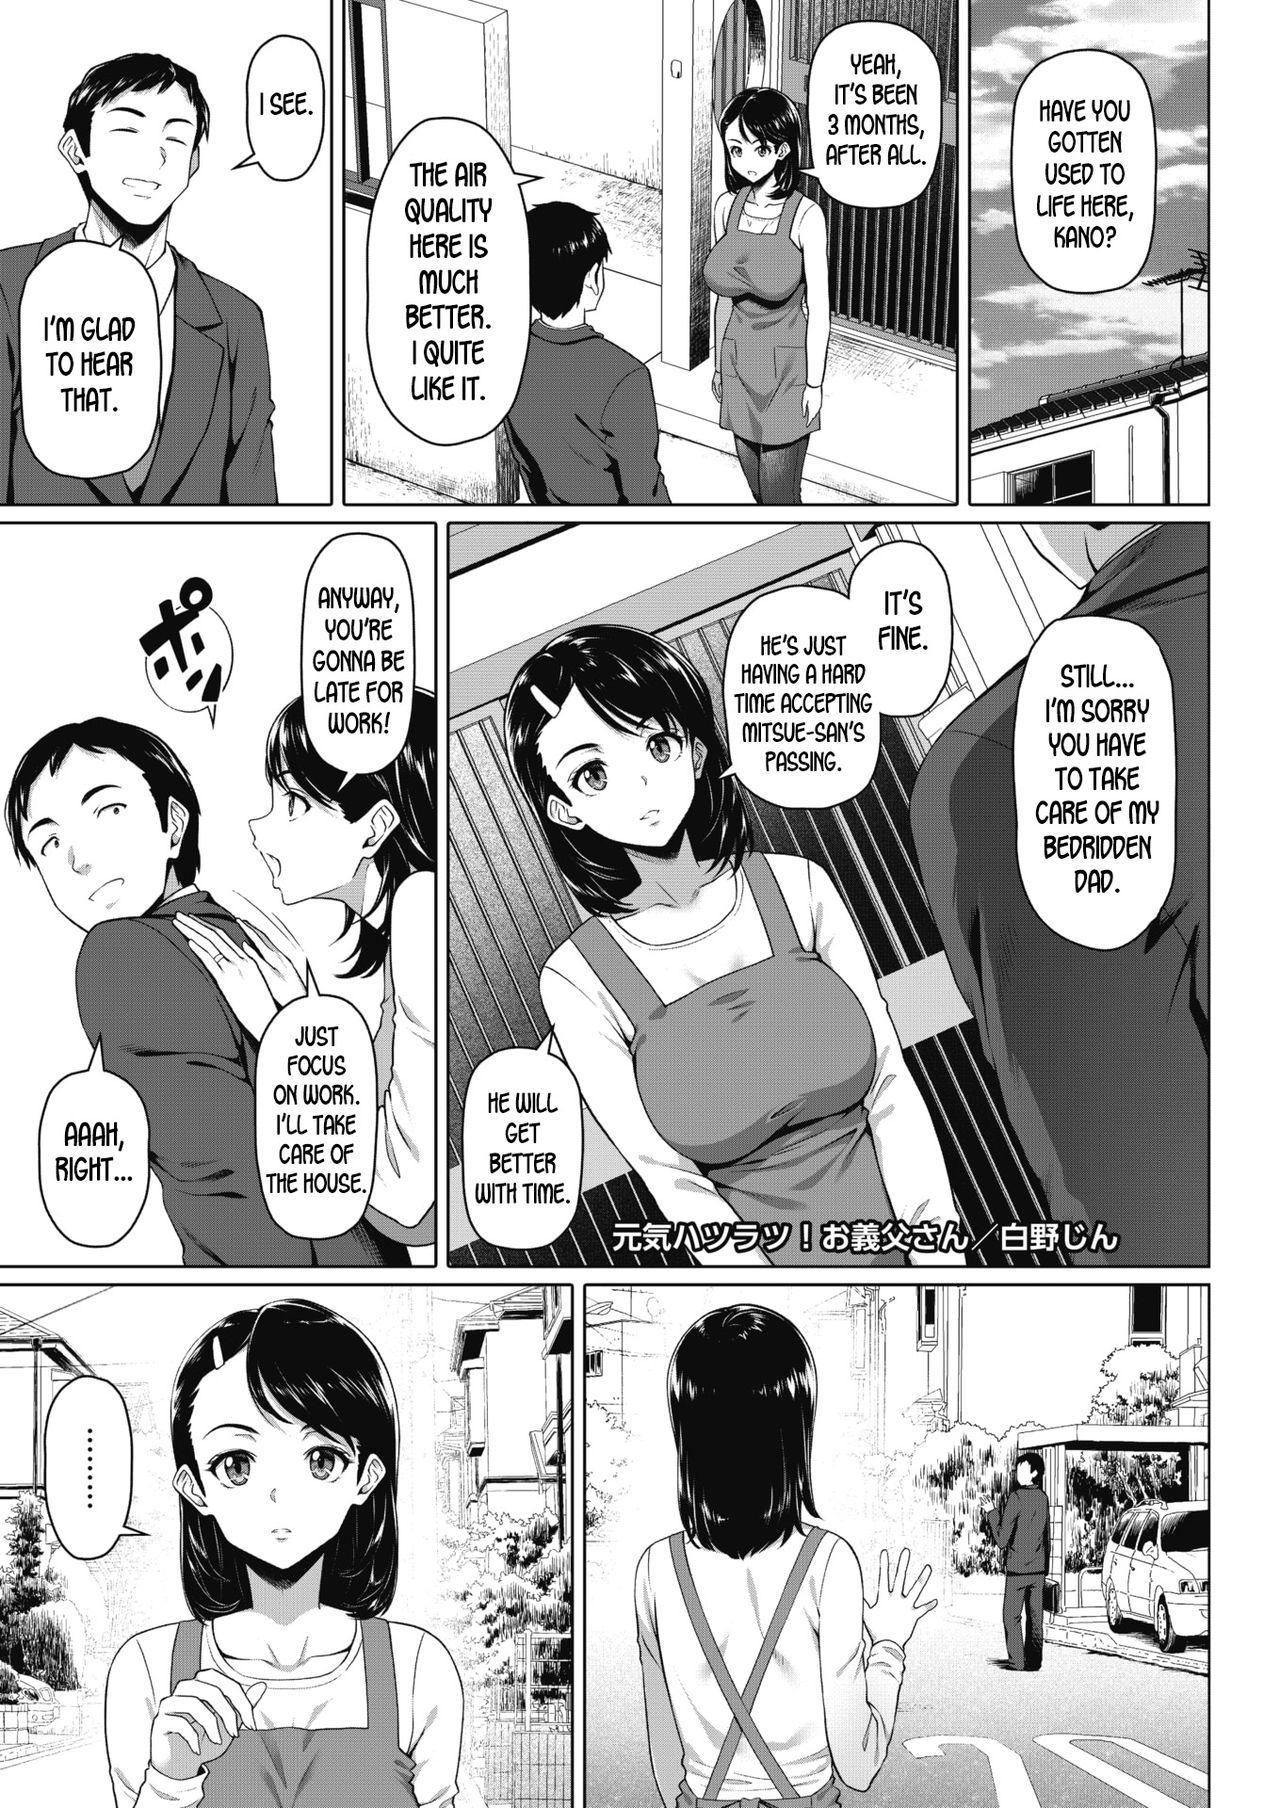 Genki Hatsuratsu! Otou-san | The Lively Father in Law 0